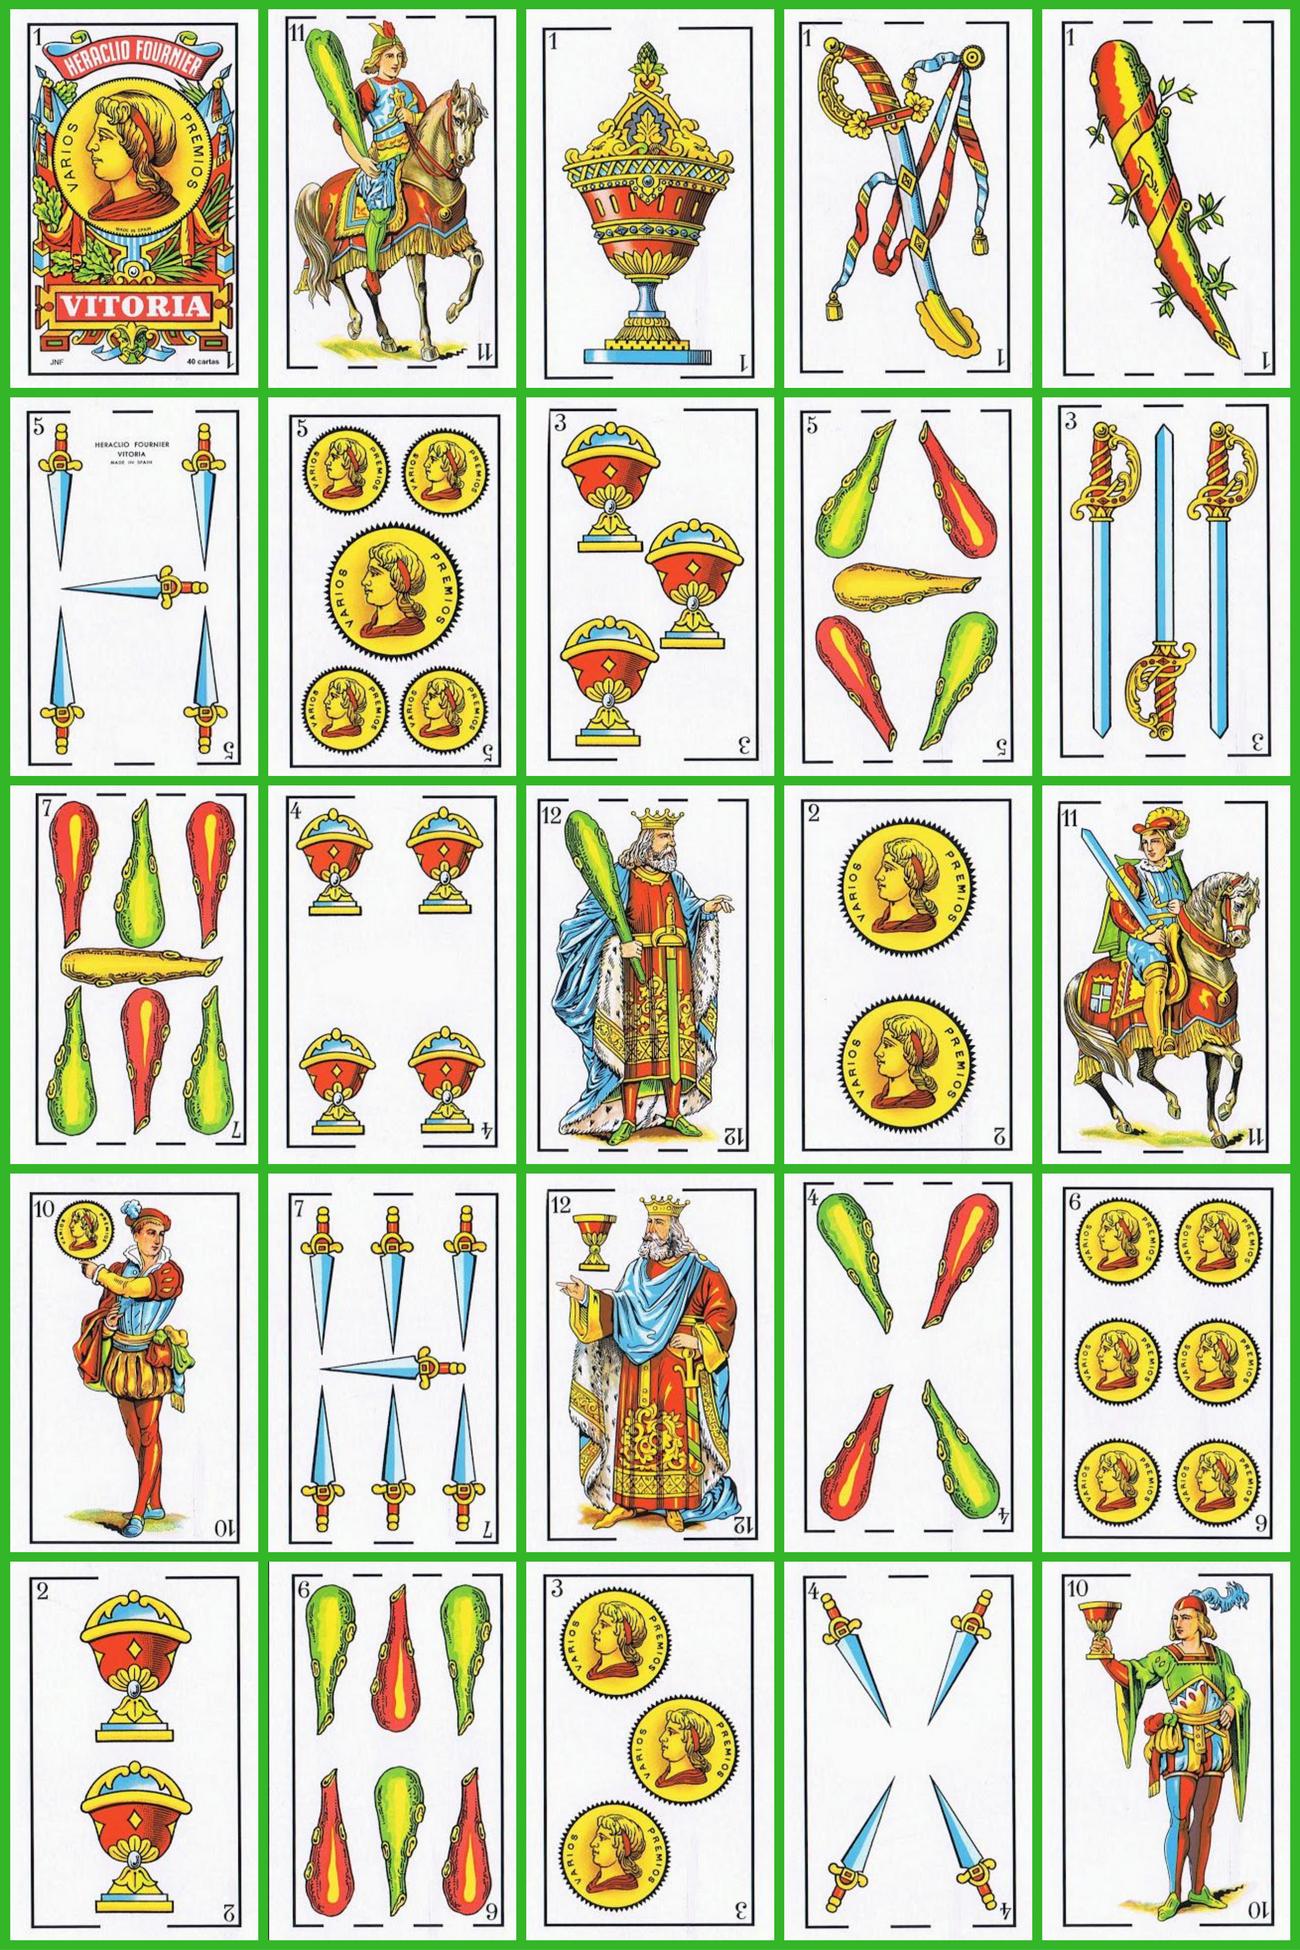 Pokino El Poquino Tarot Guide Cards Holidays And Events